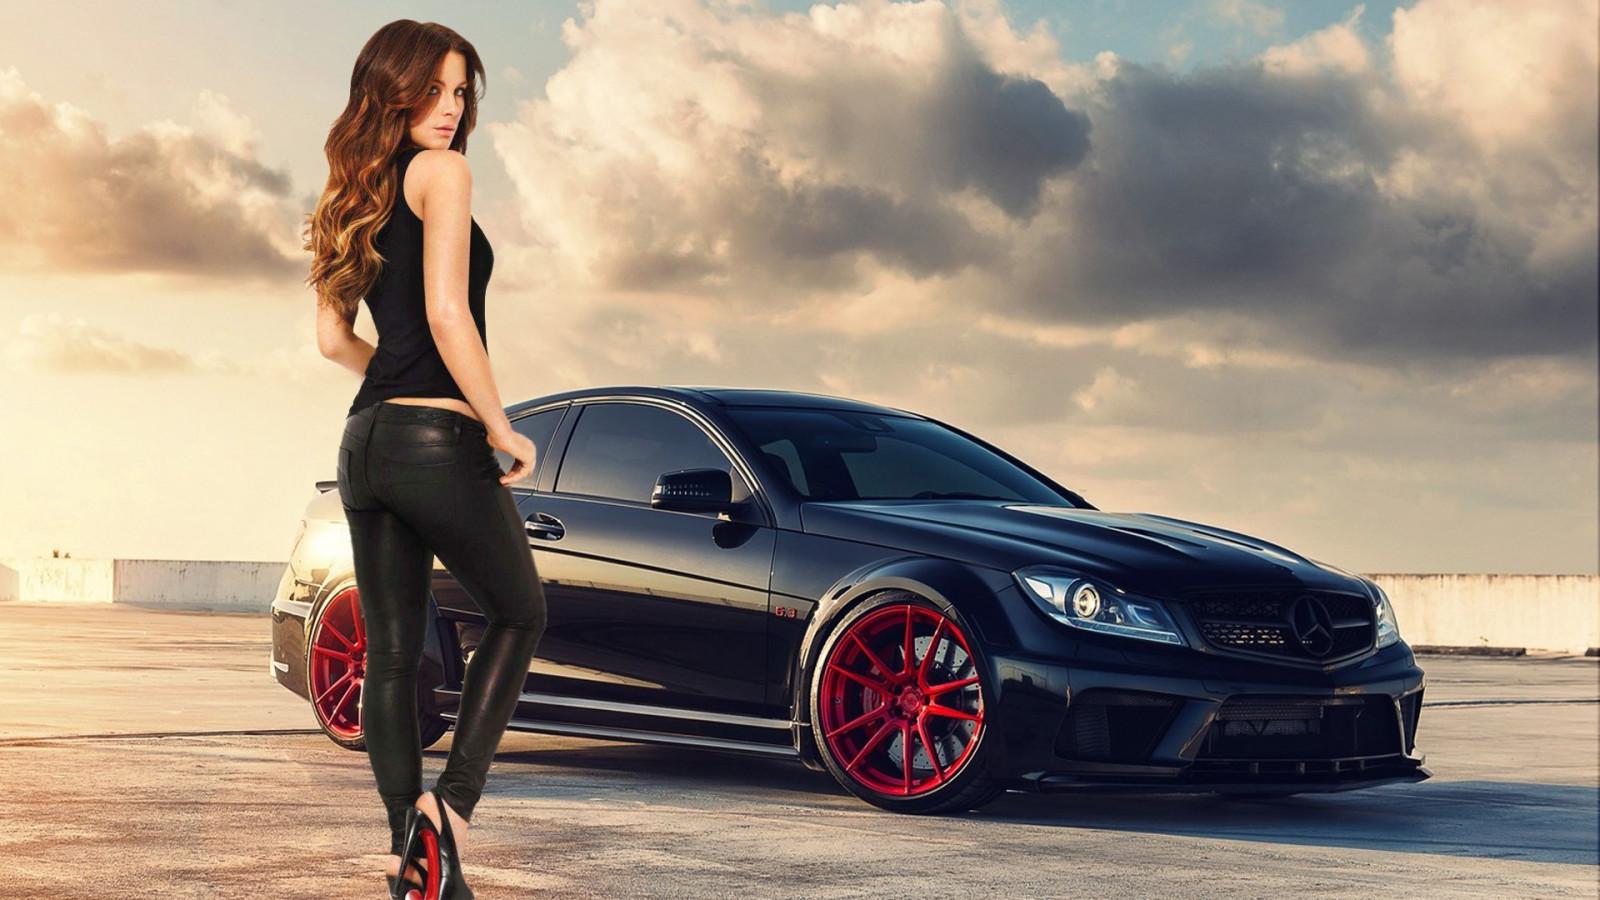 Wallpaper actress women with cars mercedes benz for Mercedes benz build a car